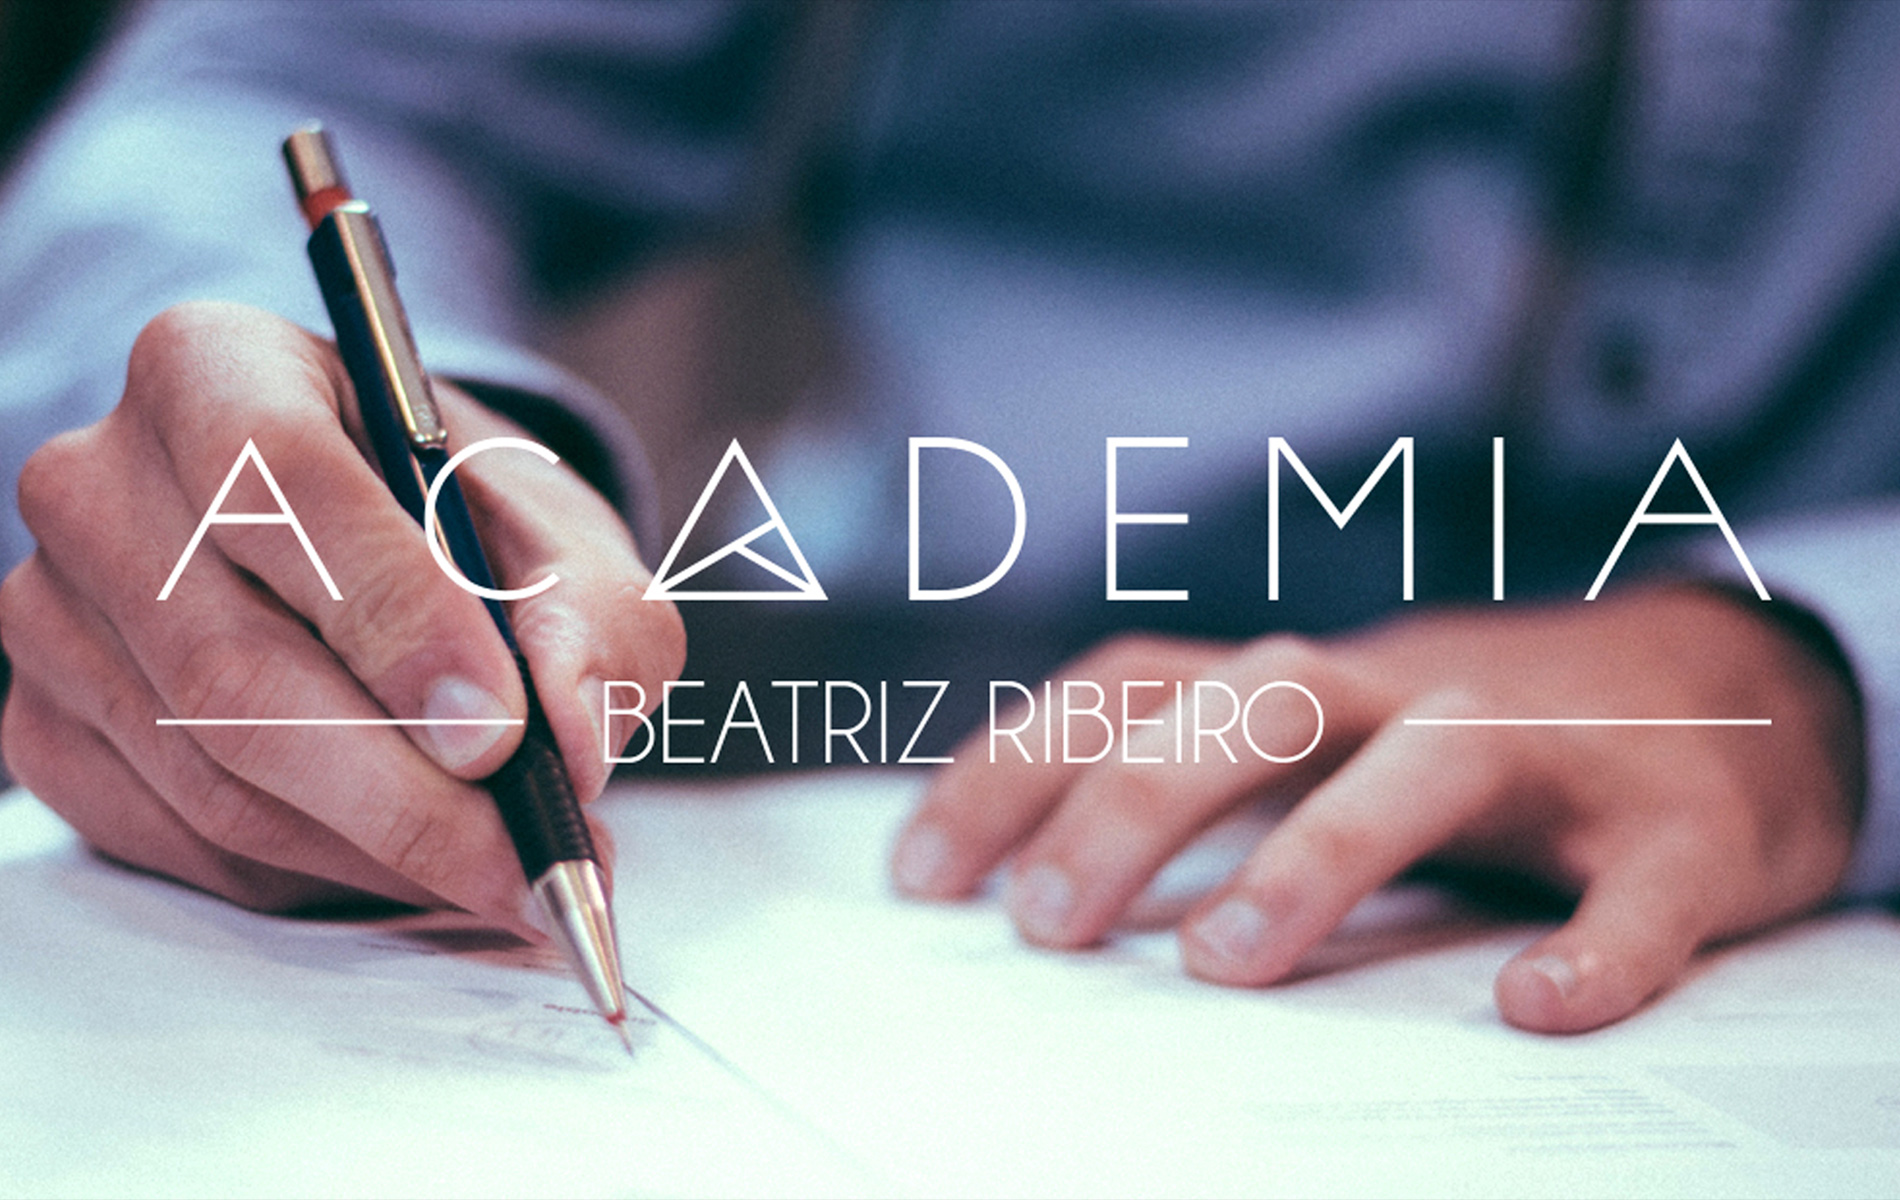 Academia Beatriz Ribeiro